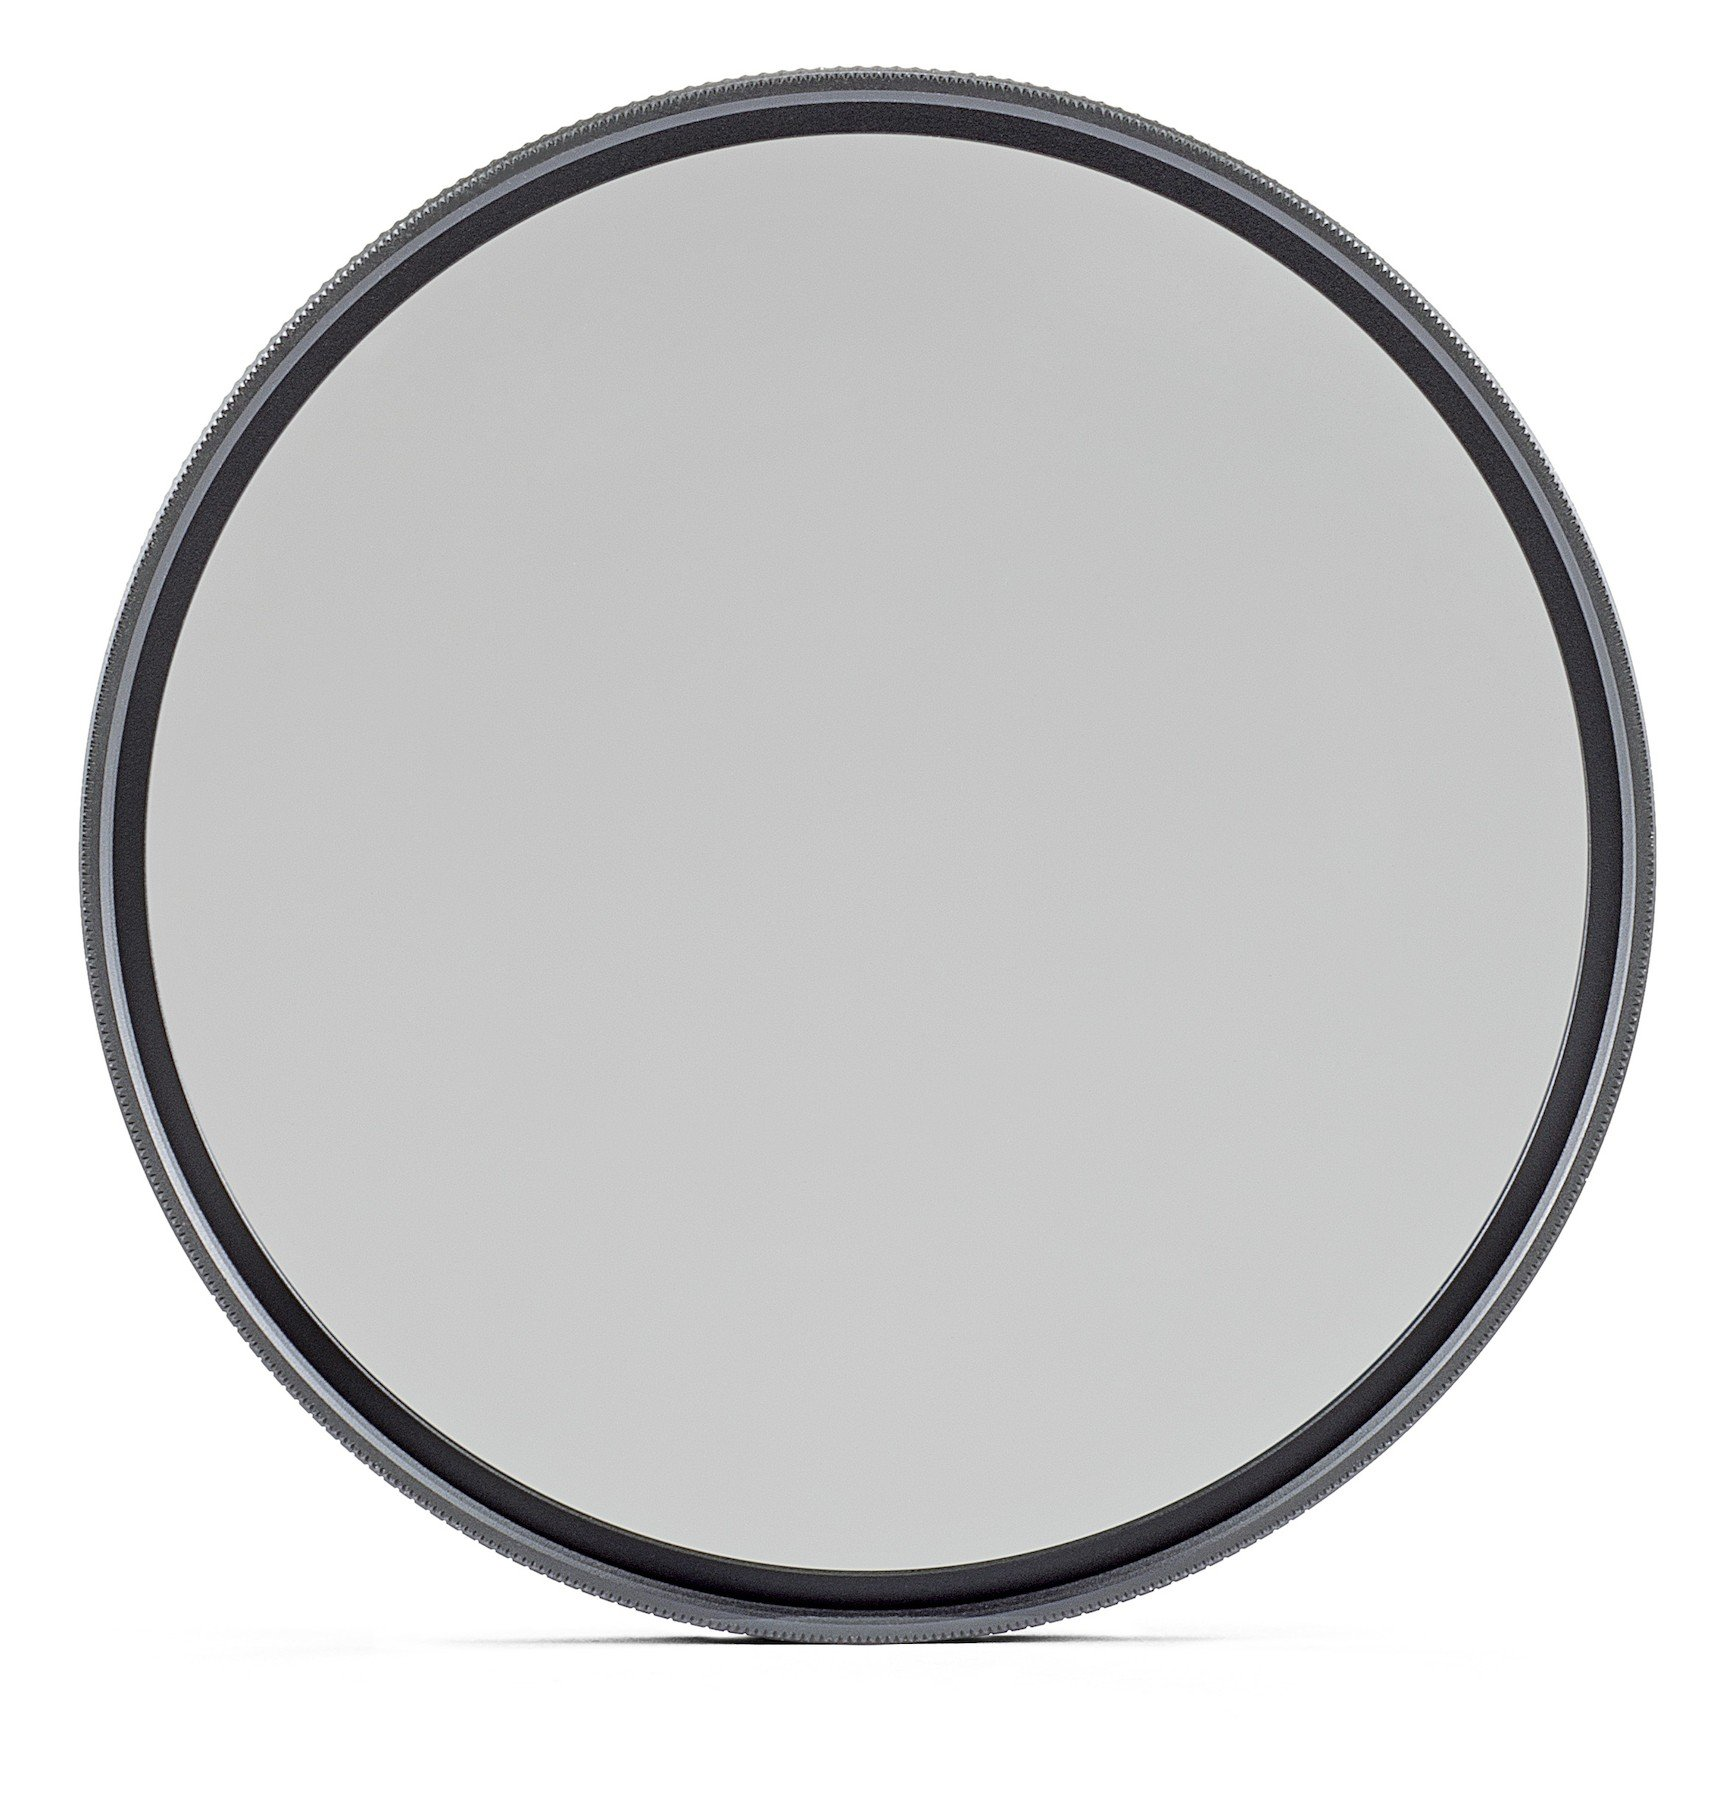 77mm Professional Circular Polarising Filter